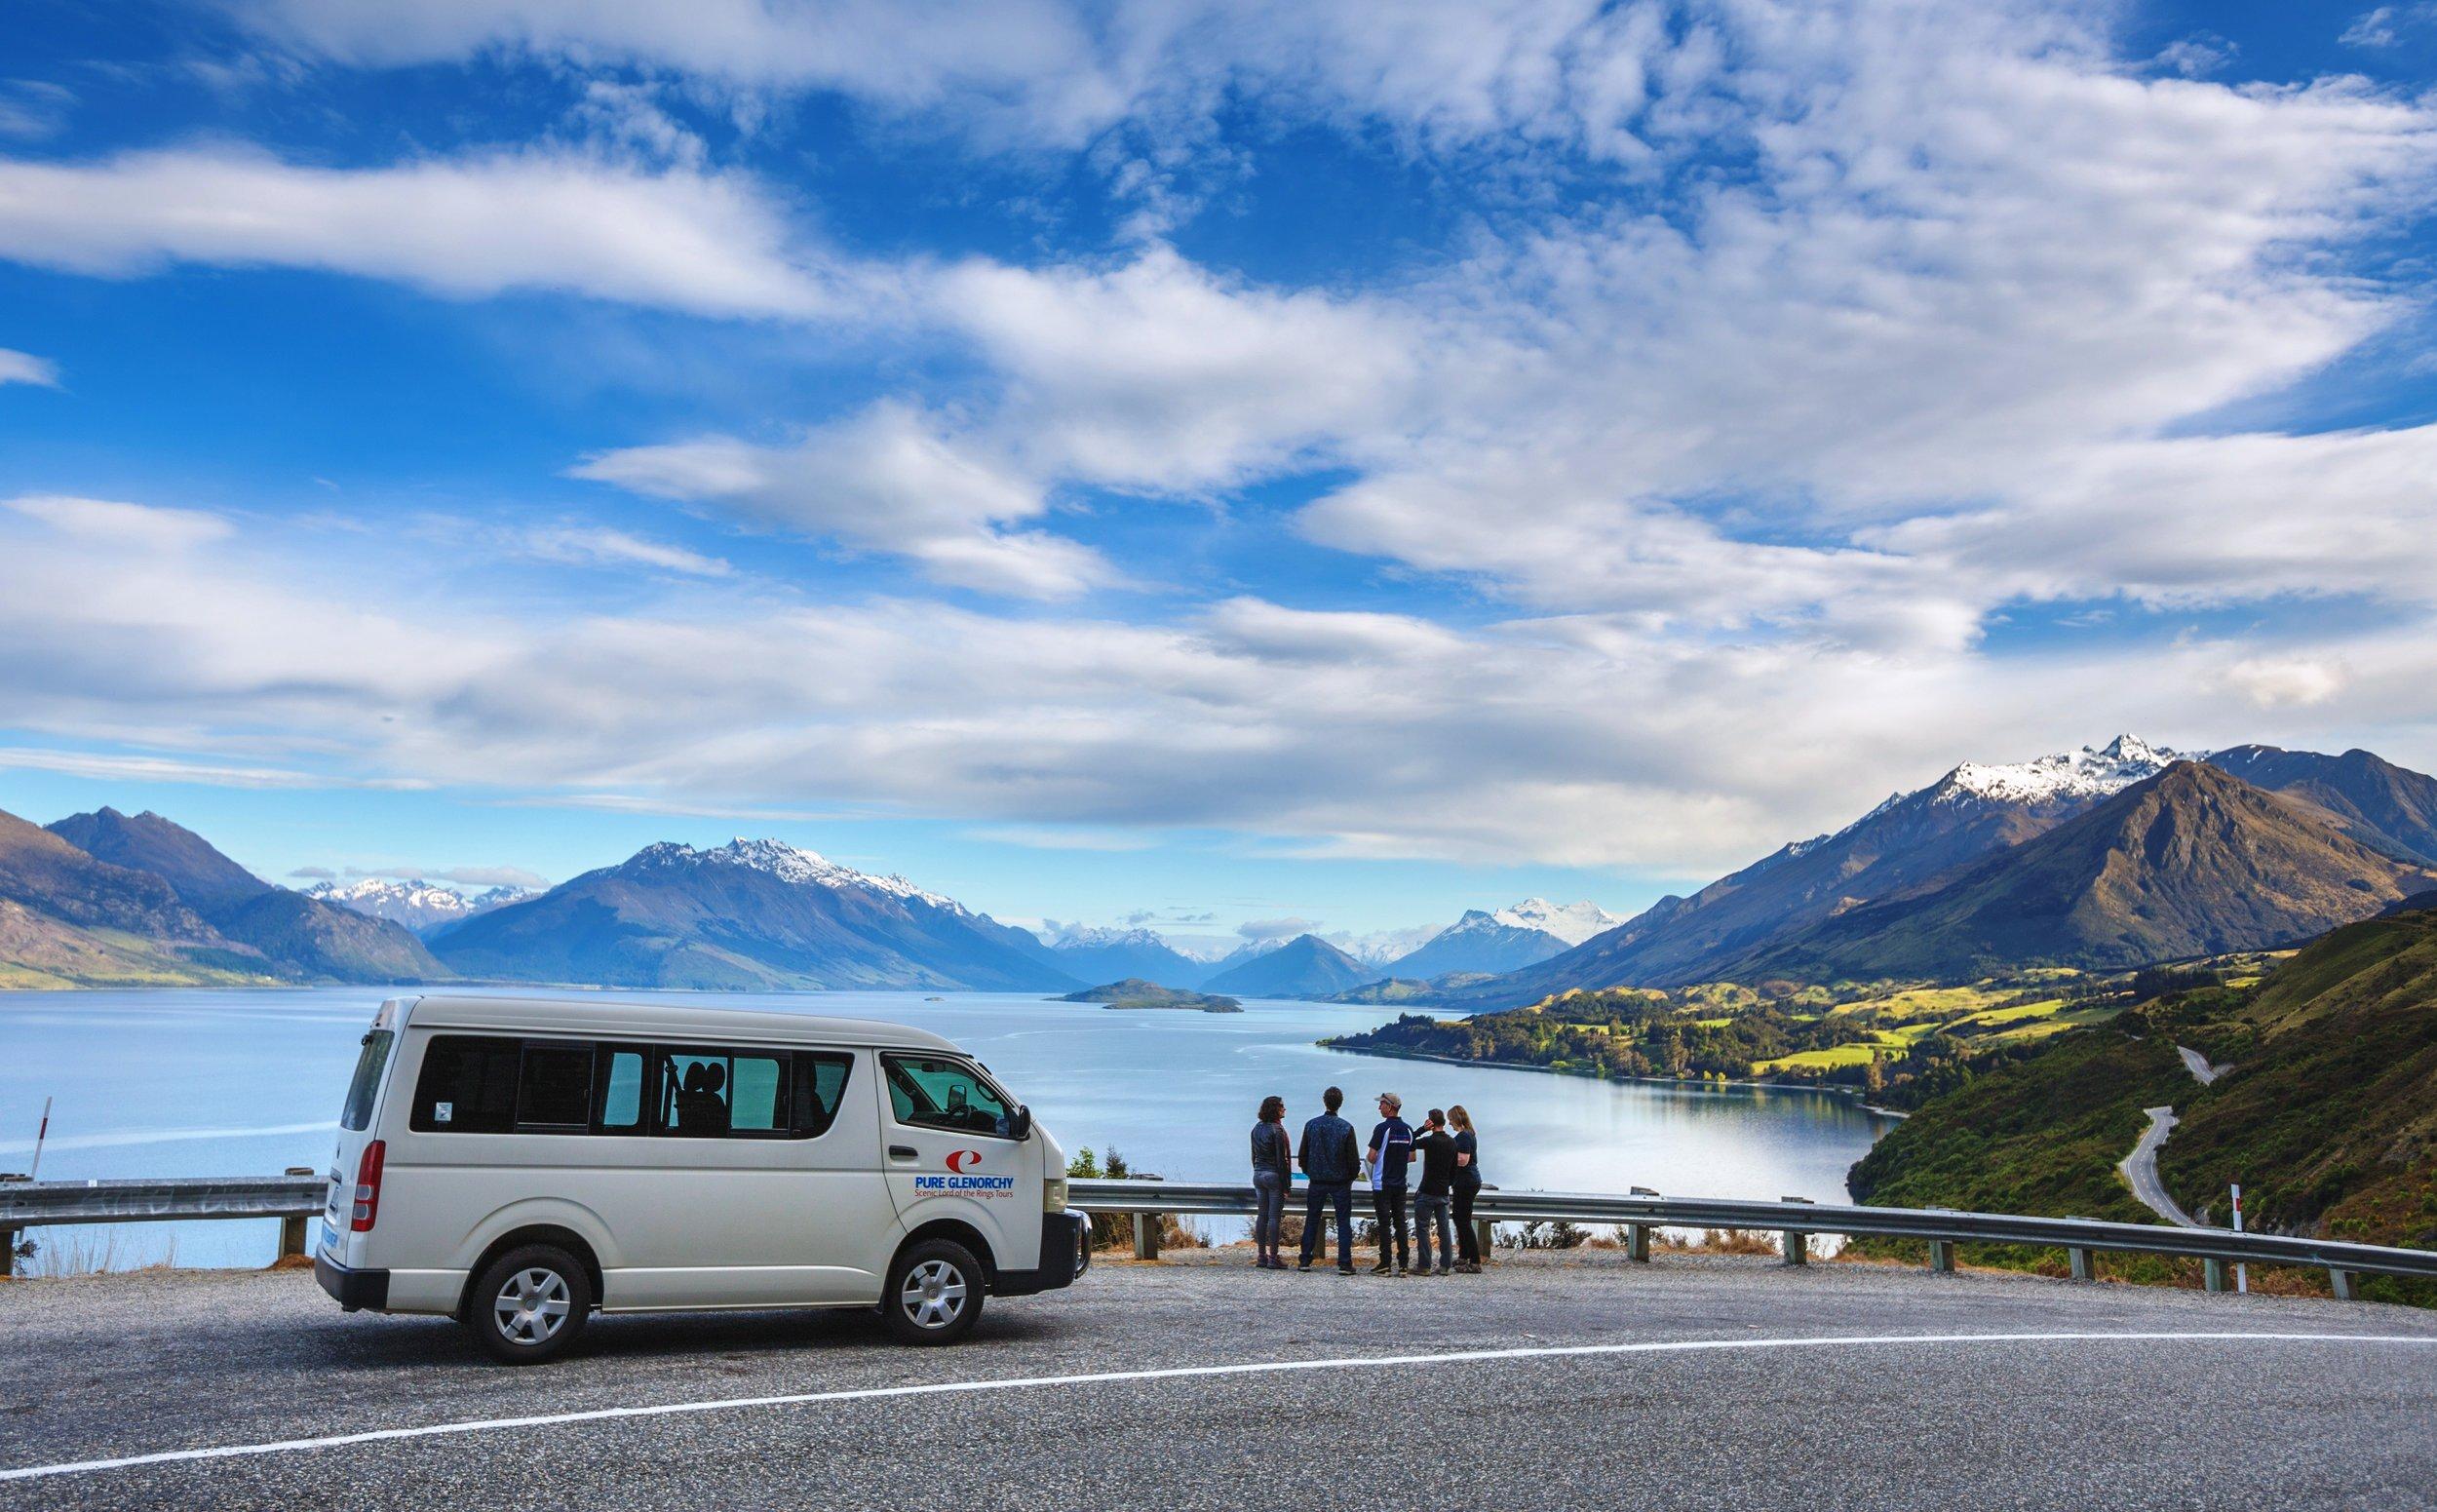 New_Zealands_most_scenic_road.jpg